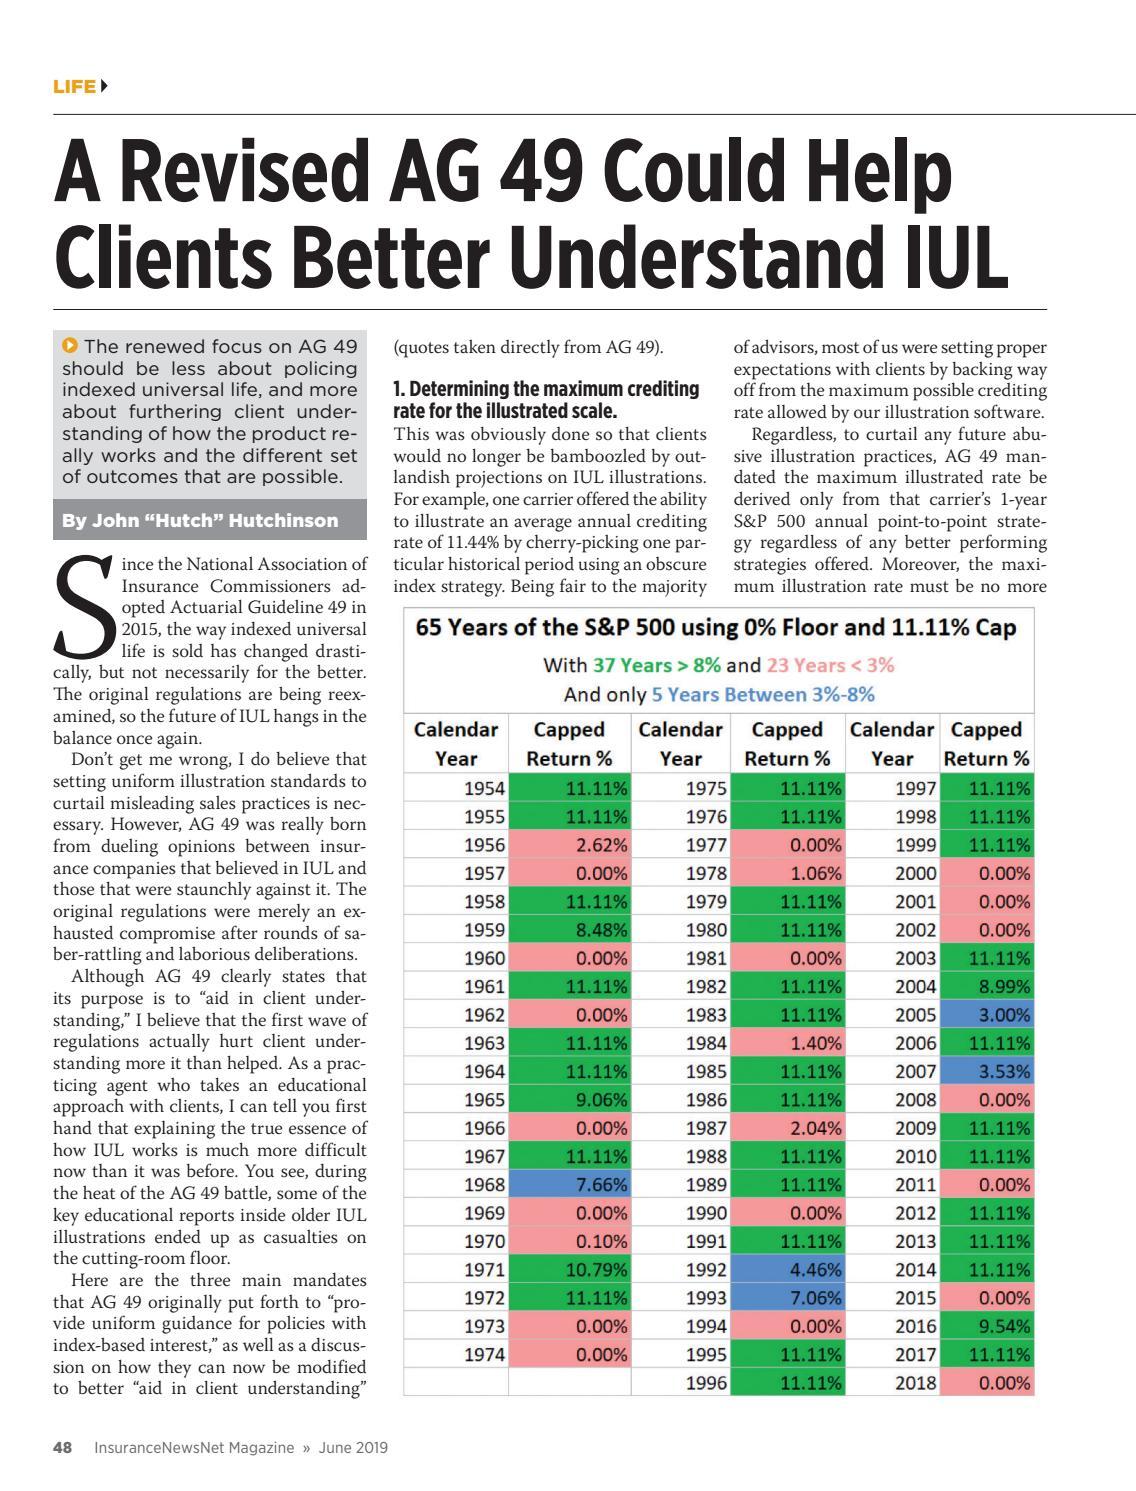 InsuranceNewsNet Magazine - June 2019 by InsuranceNewsNet ...